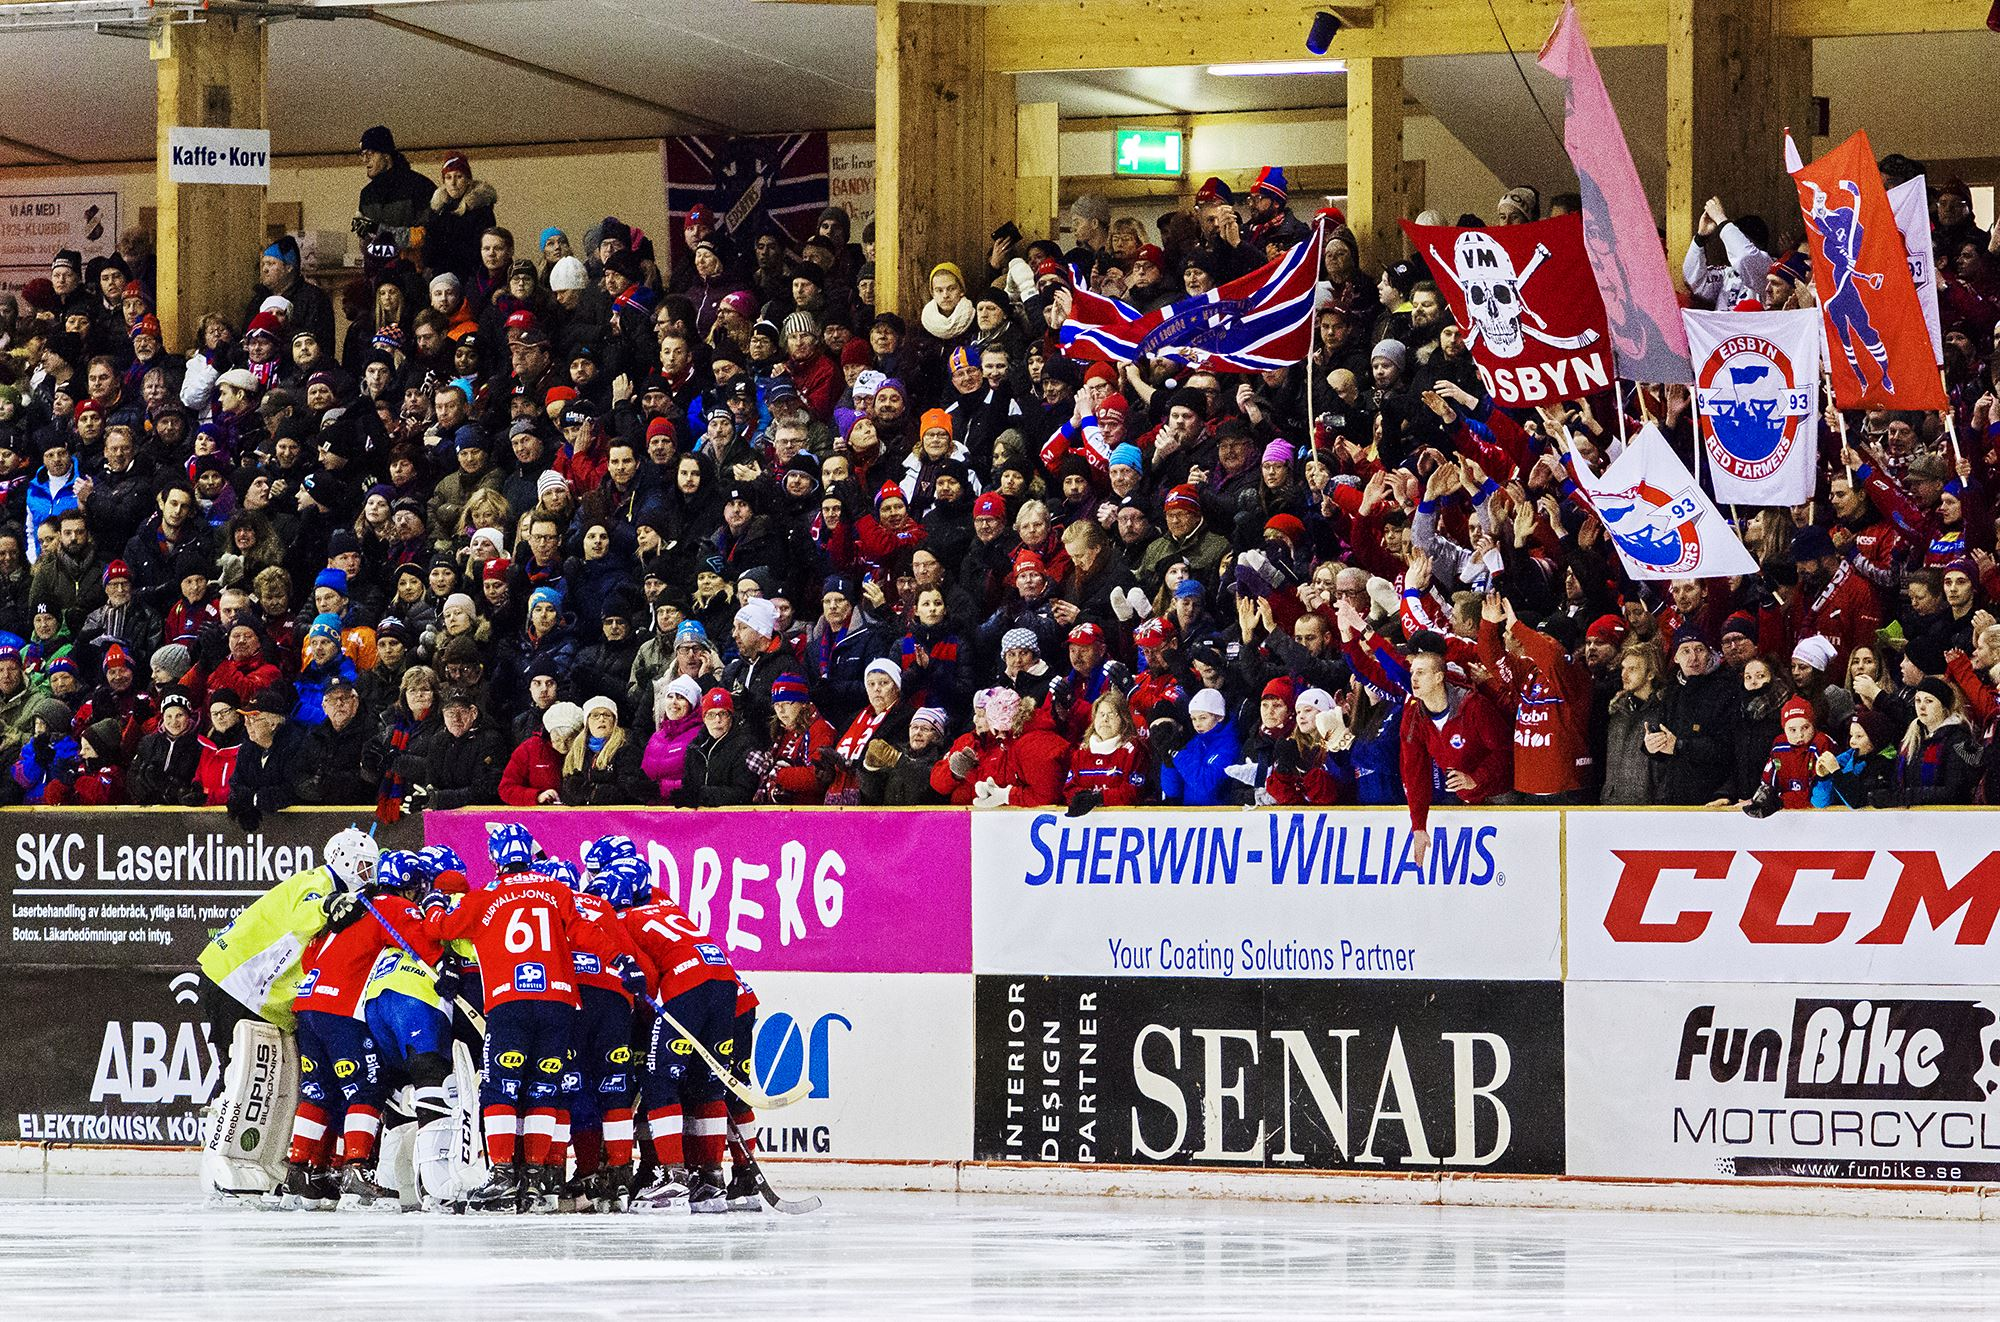 Edsbyns IF Bandy - Sandvikens AIK